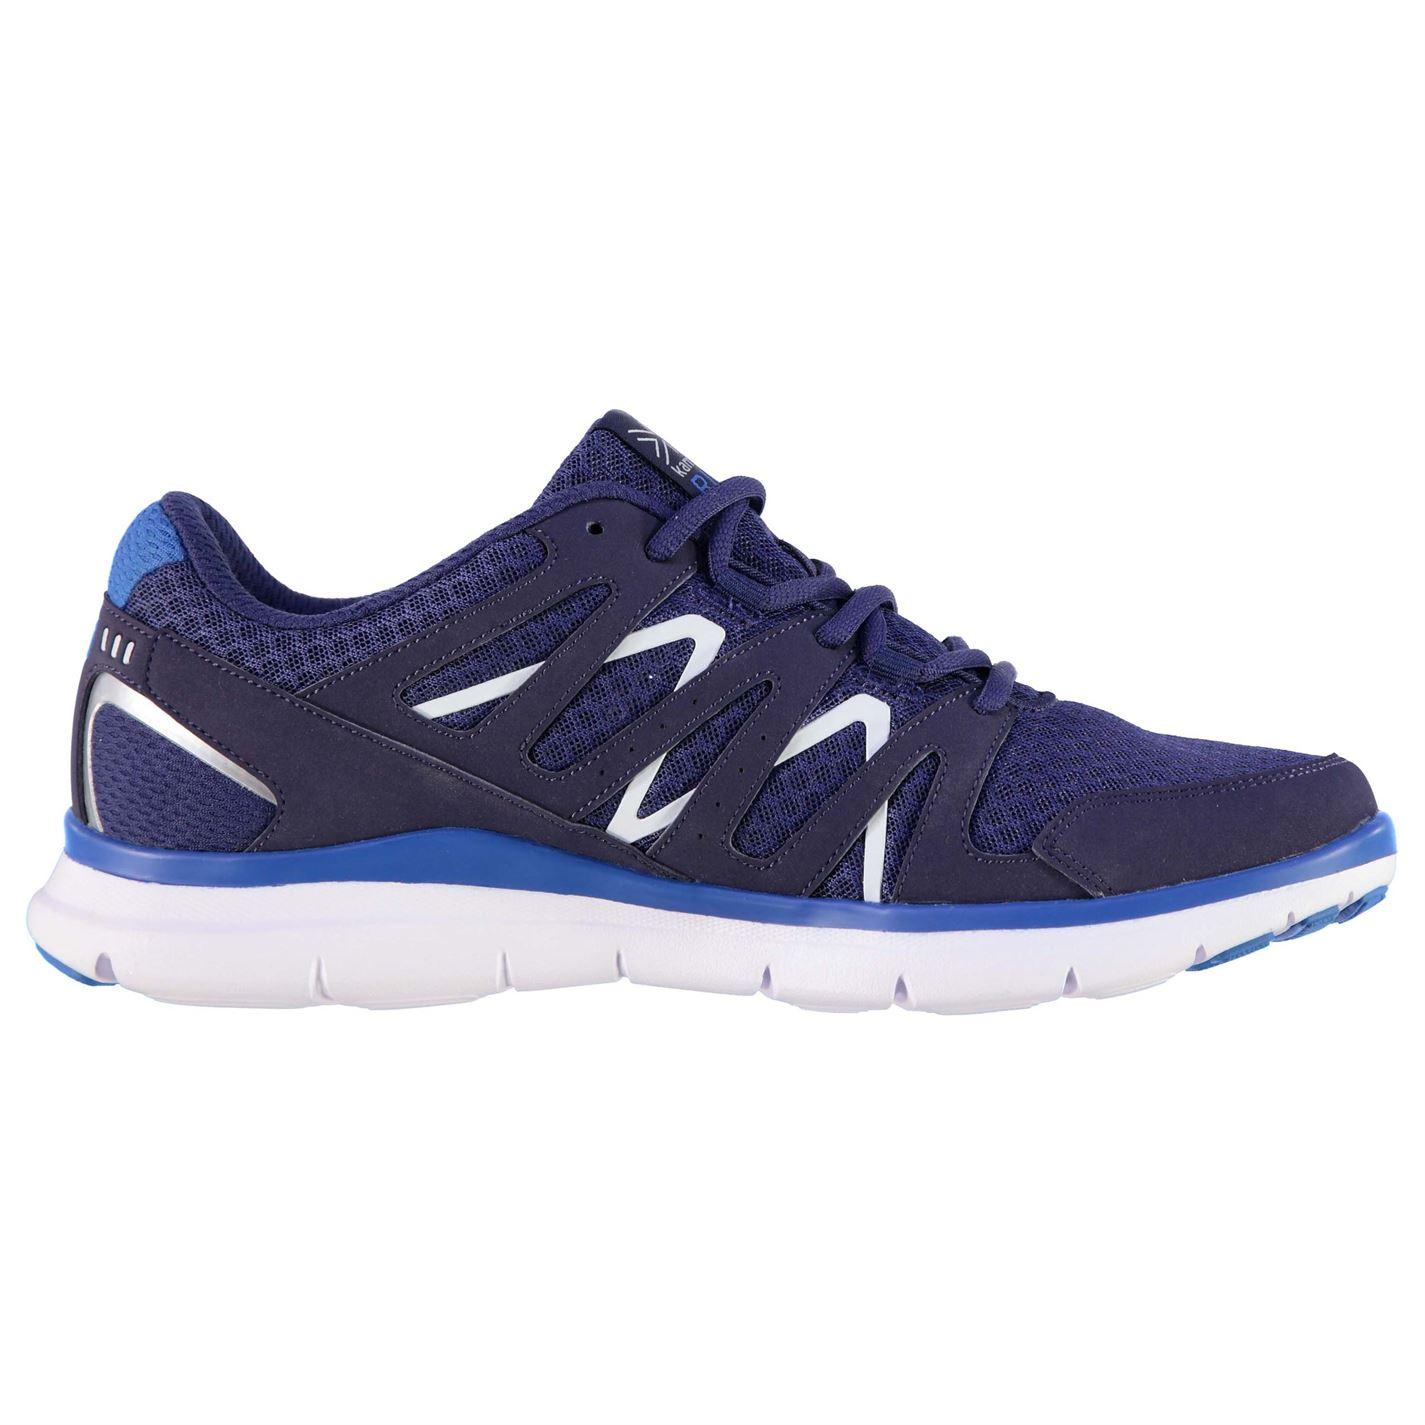 Karrimor-Mens-Duma-Trainers-Lace-Up-Sports-Running-Cross-Training-Shoes thumbnail 25